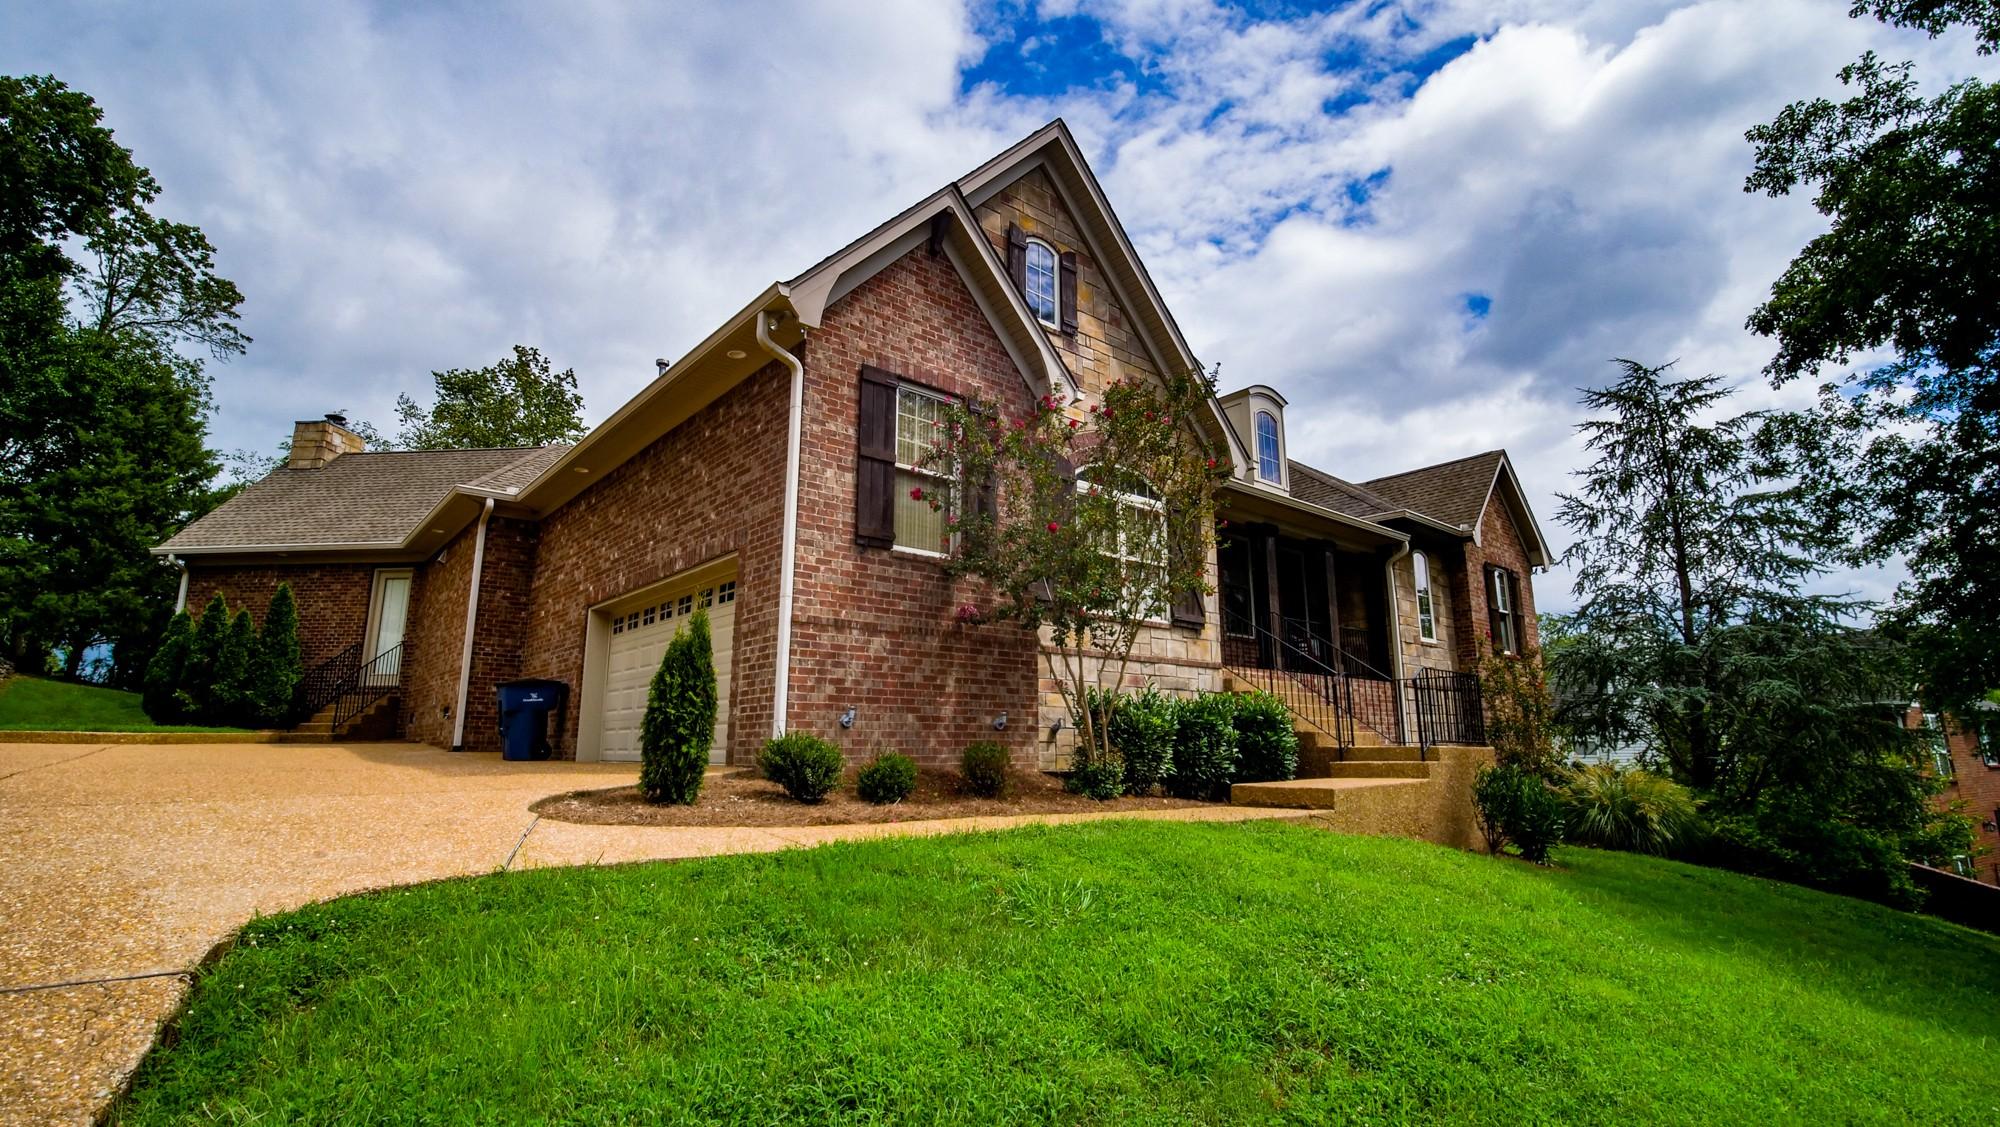 505 Salt Lick Trl Property Photo - Goodlettsville, TN real estate listing